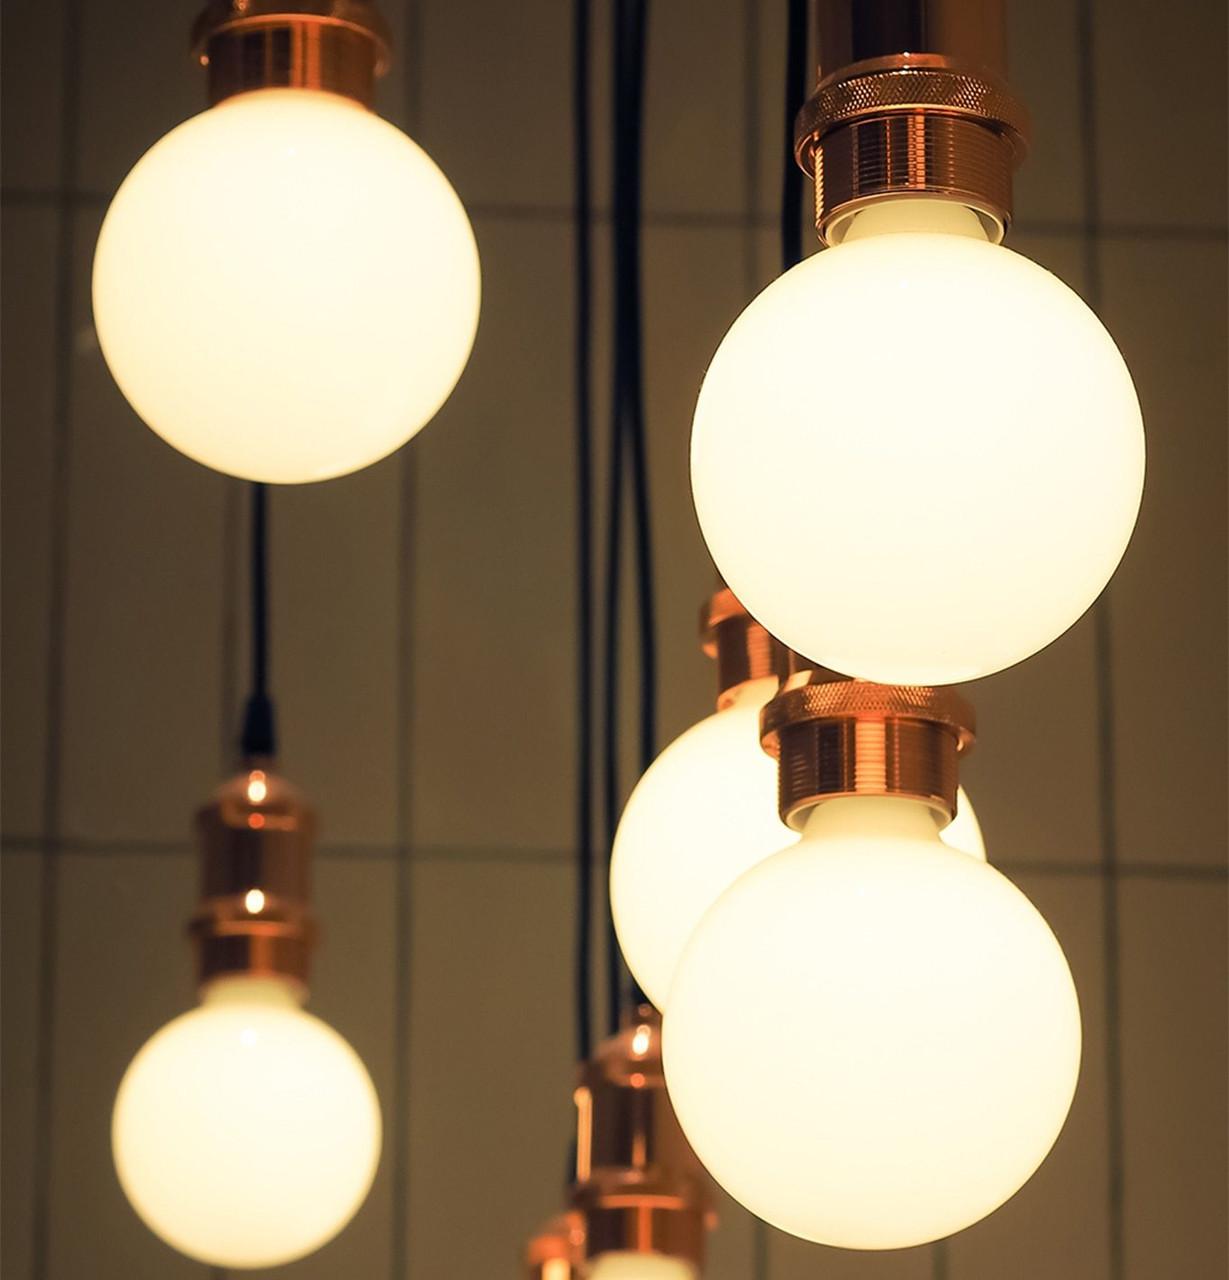 LED Dimmable G80 2200K Light Bulbs